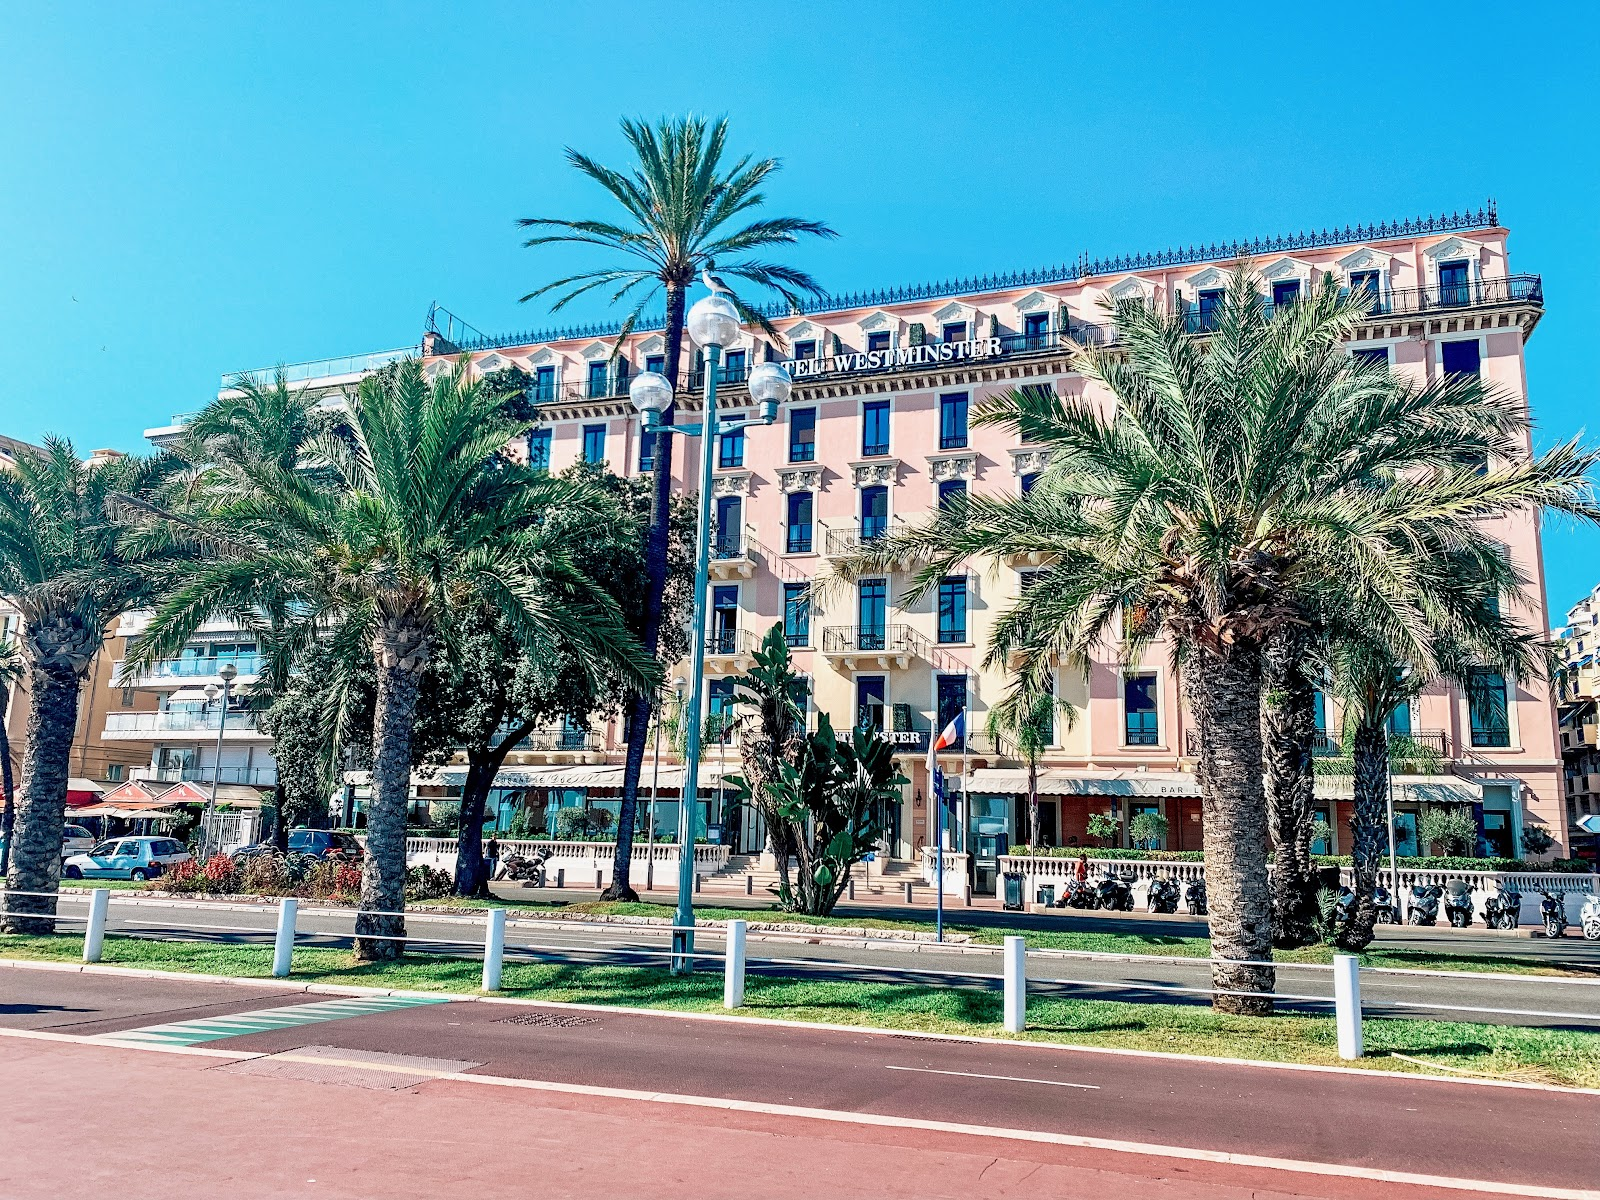 Hotel Westminster, visit Nice